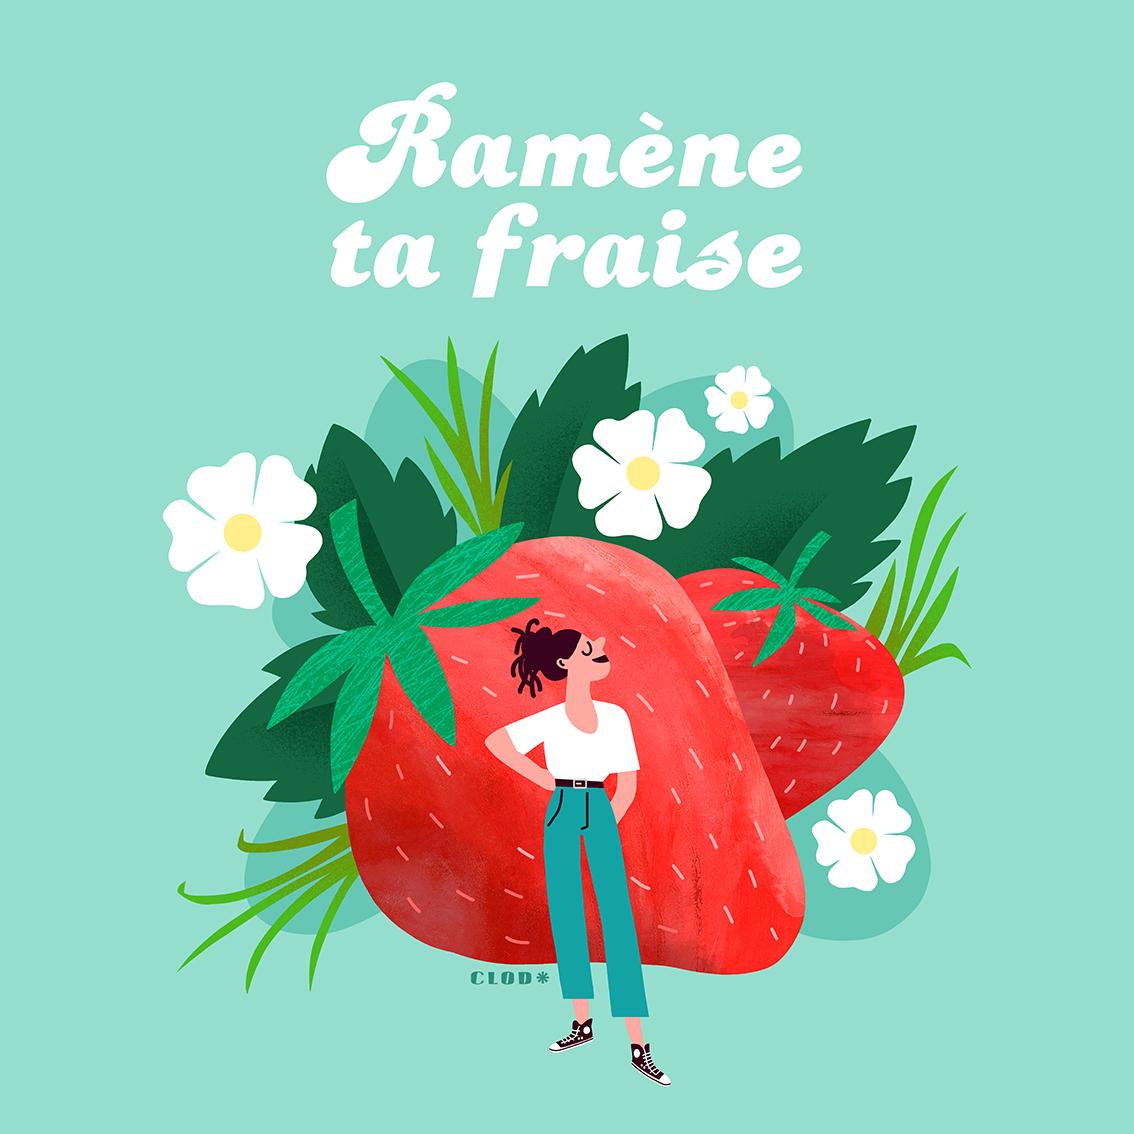 Clod illustration Ramène ta fraise